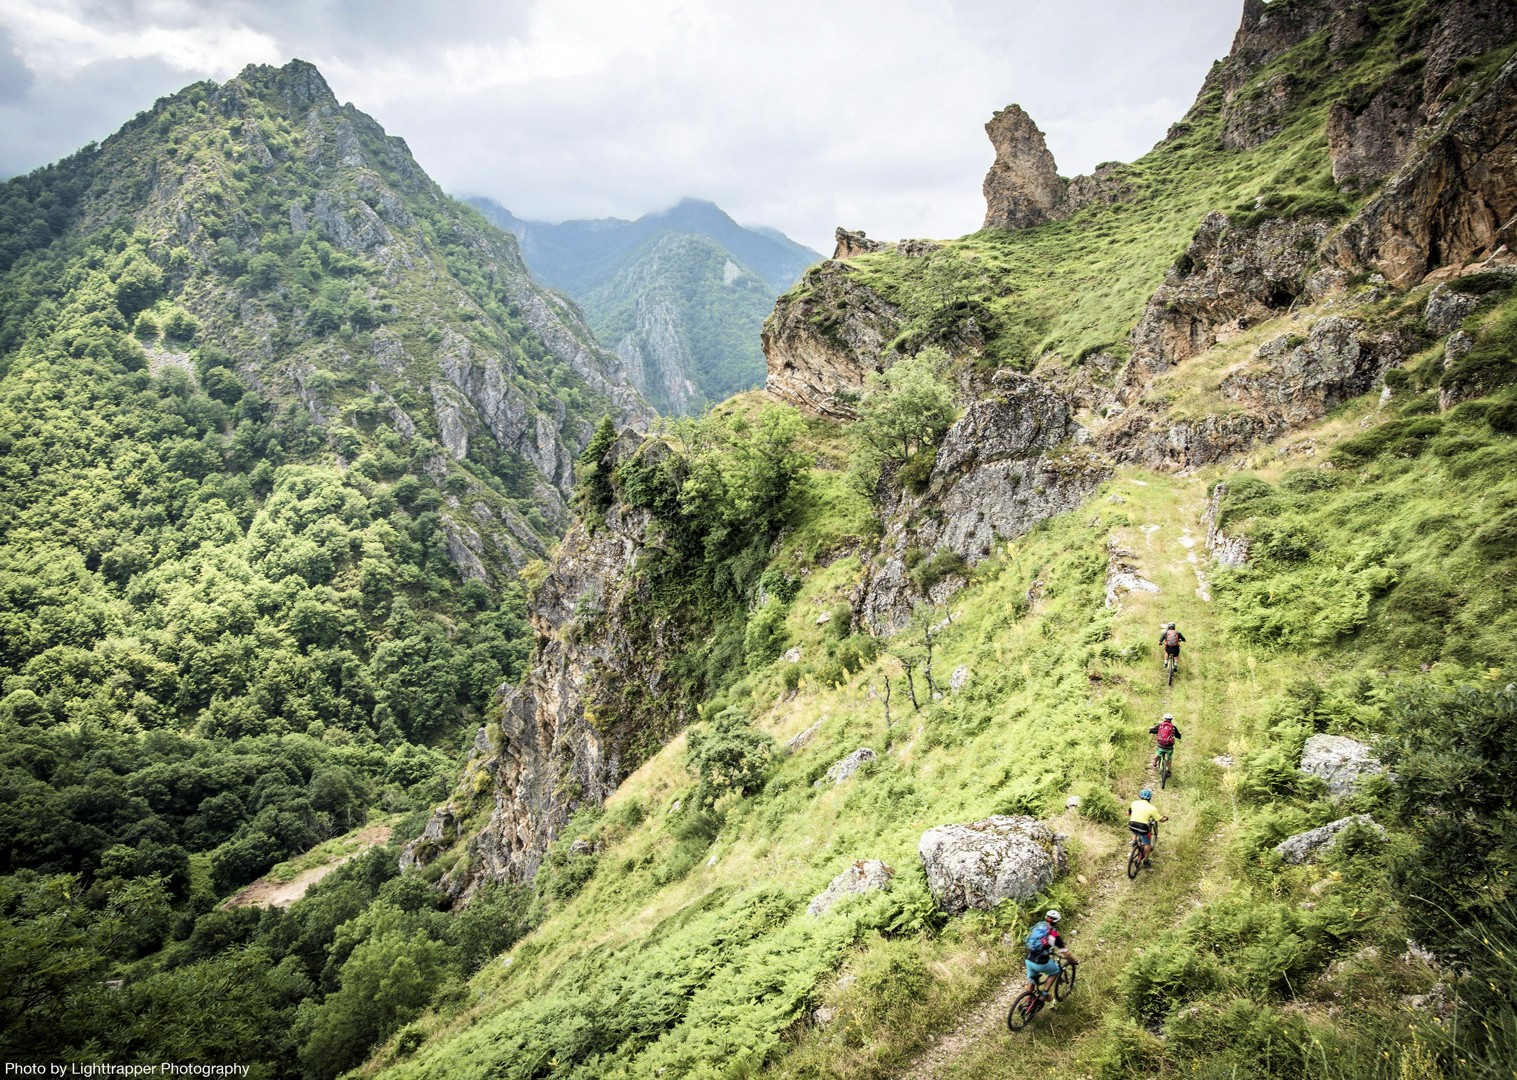 dramatic-mountain-biking-northern-spain-picos-de-europa.jpg - Spain - Picos de Europa - Trans Picos - Guided Mountain Bike Holiday - Mountain Biking